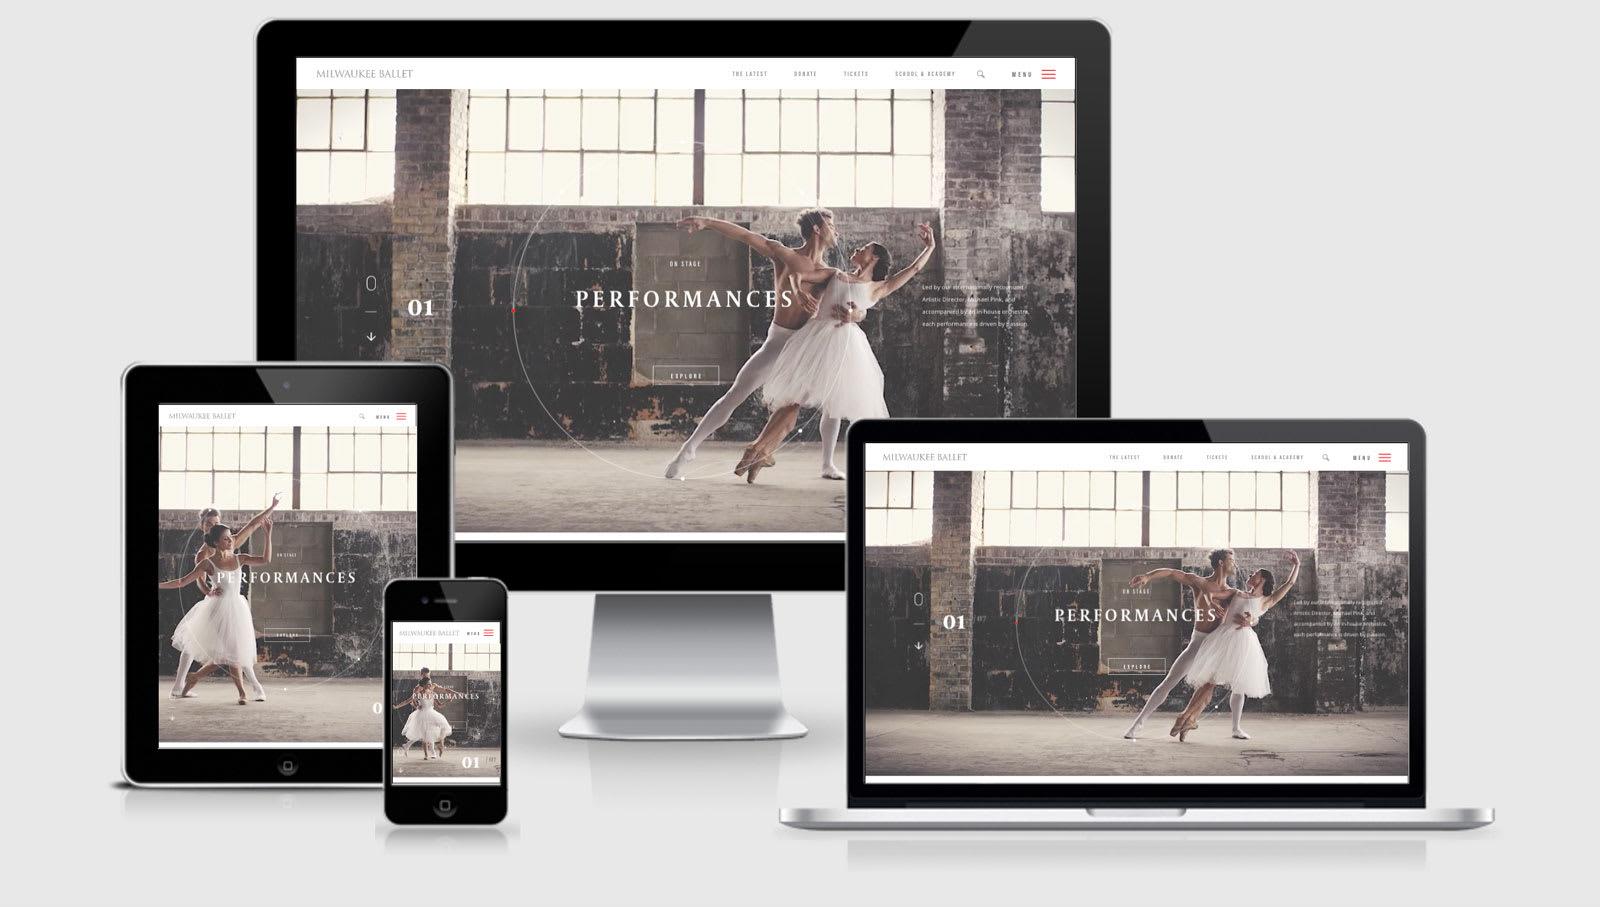 Milwaukee Ballet across 4 viewports